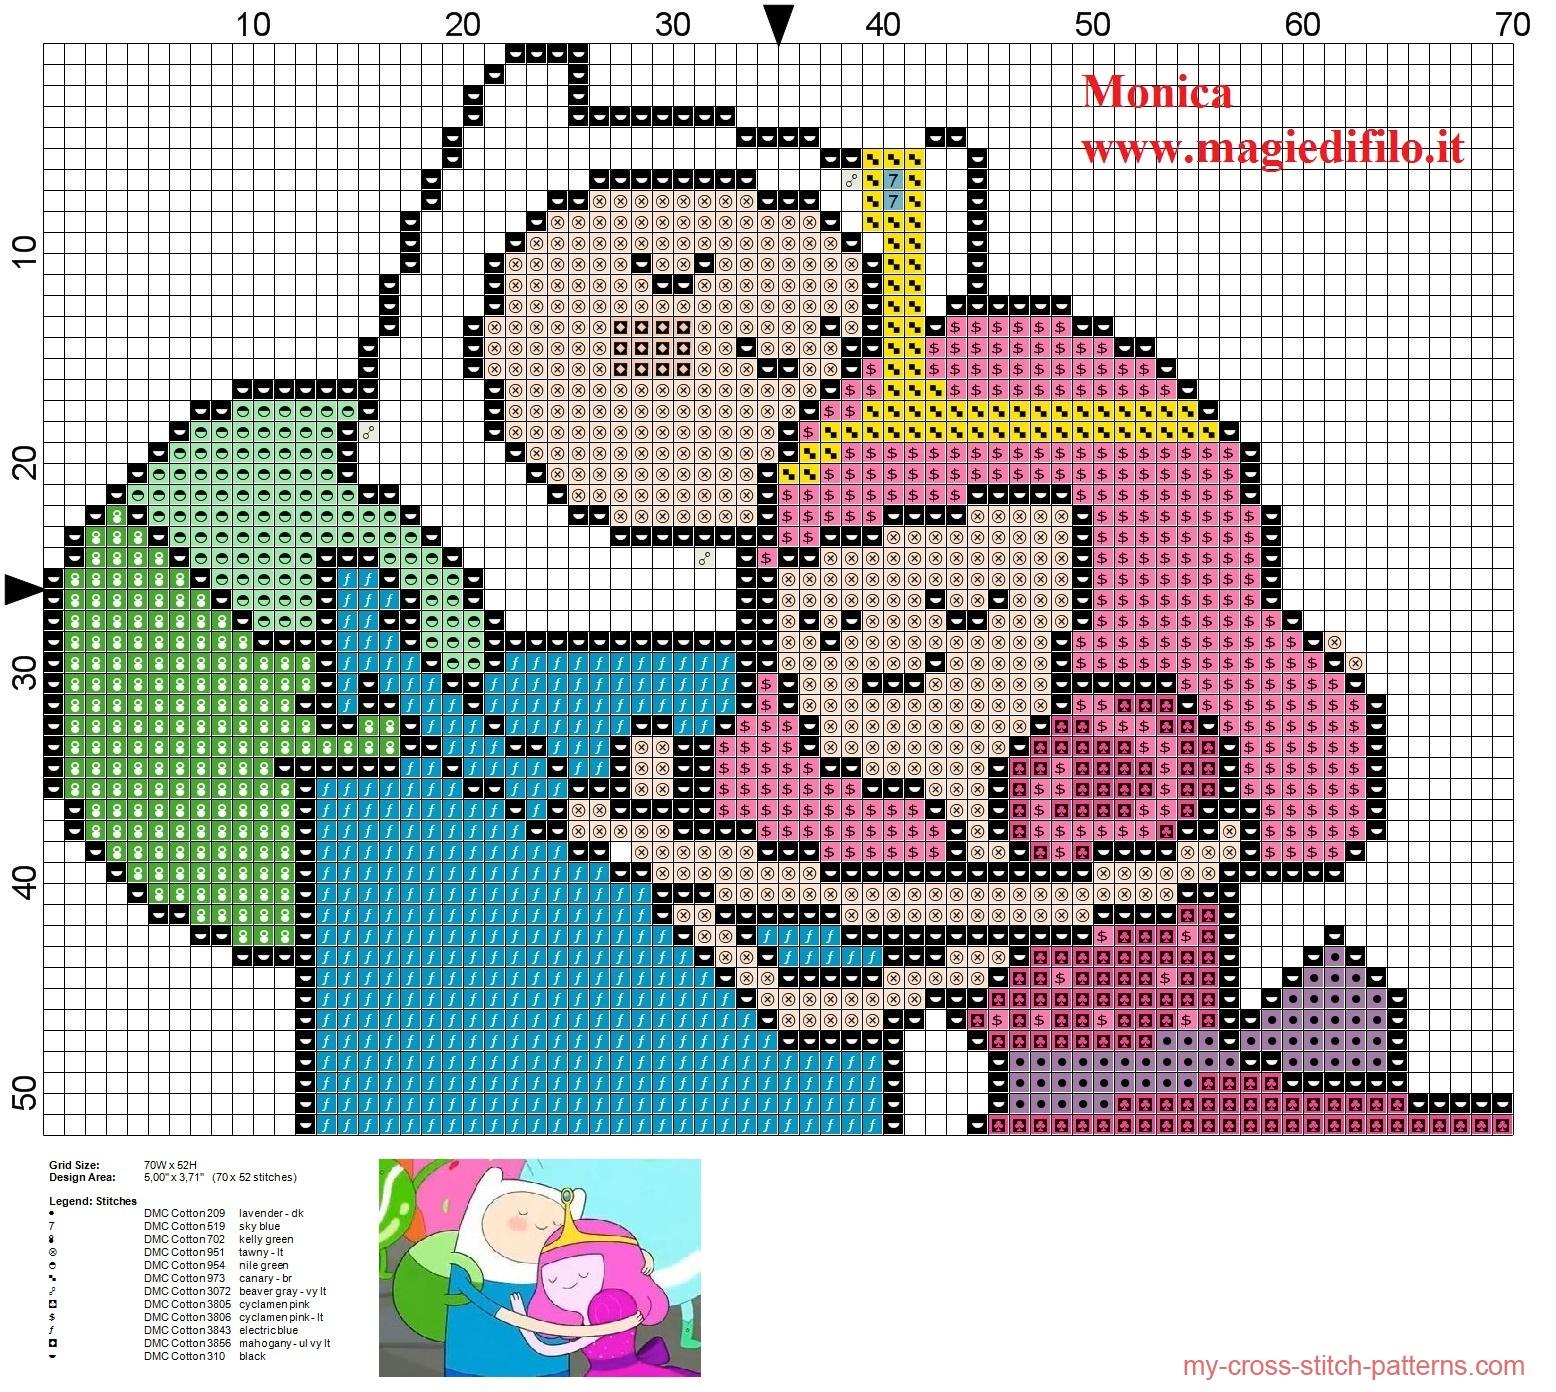 finn_with_princess_bubblegum_adventure_time_cross_stitch_pattern